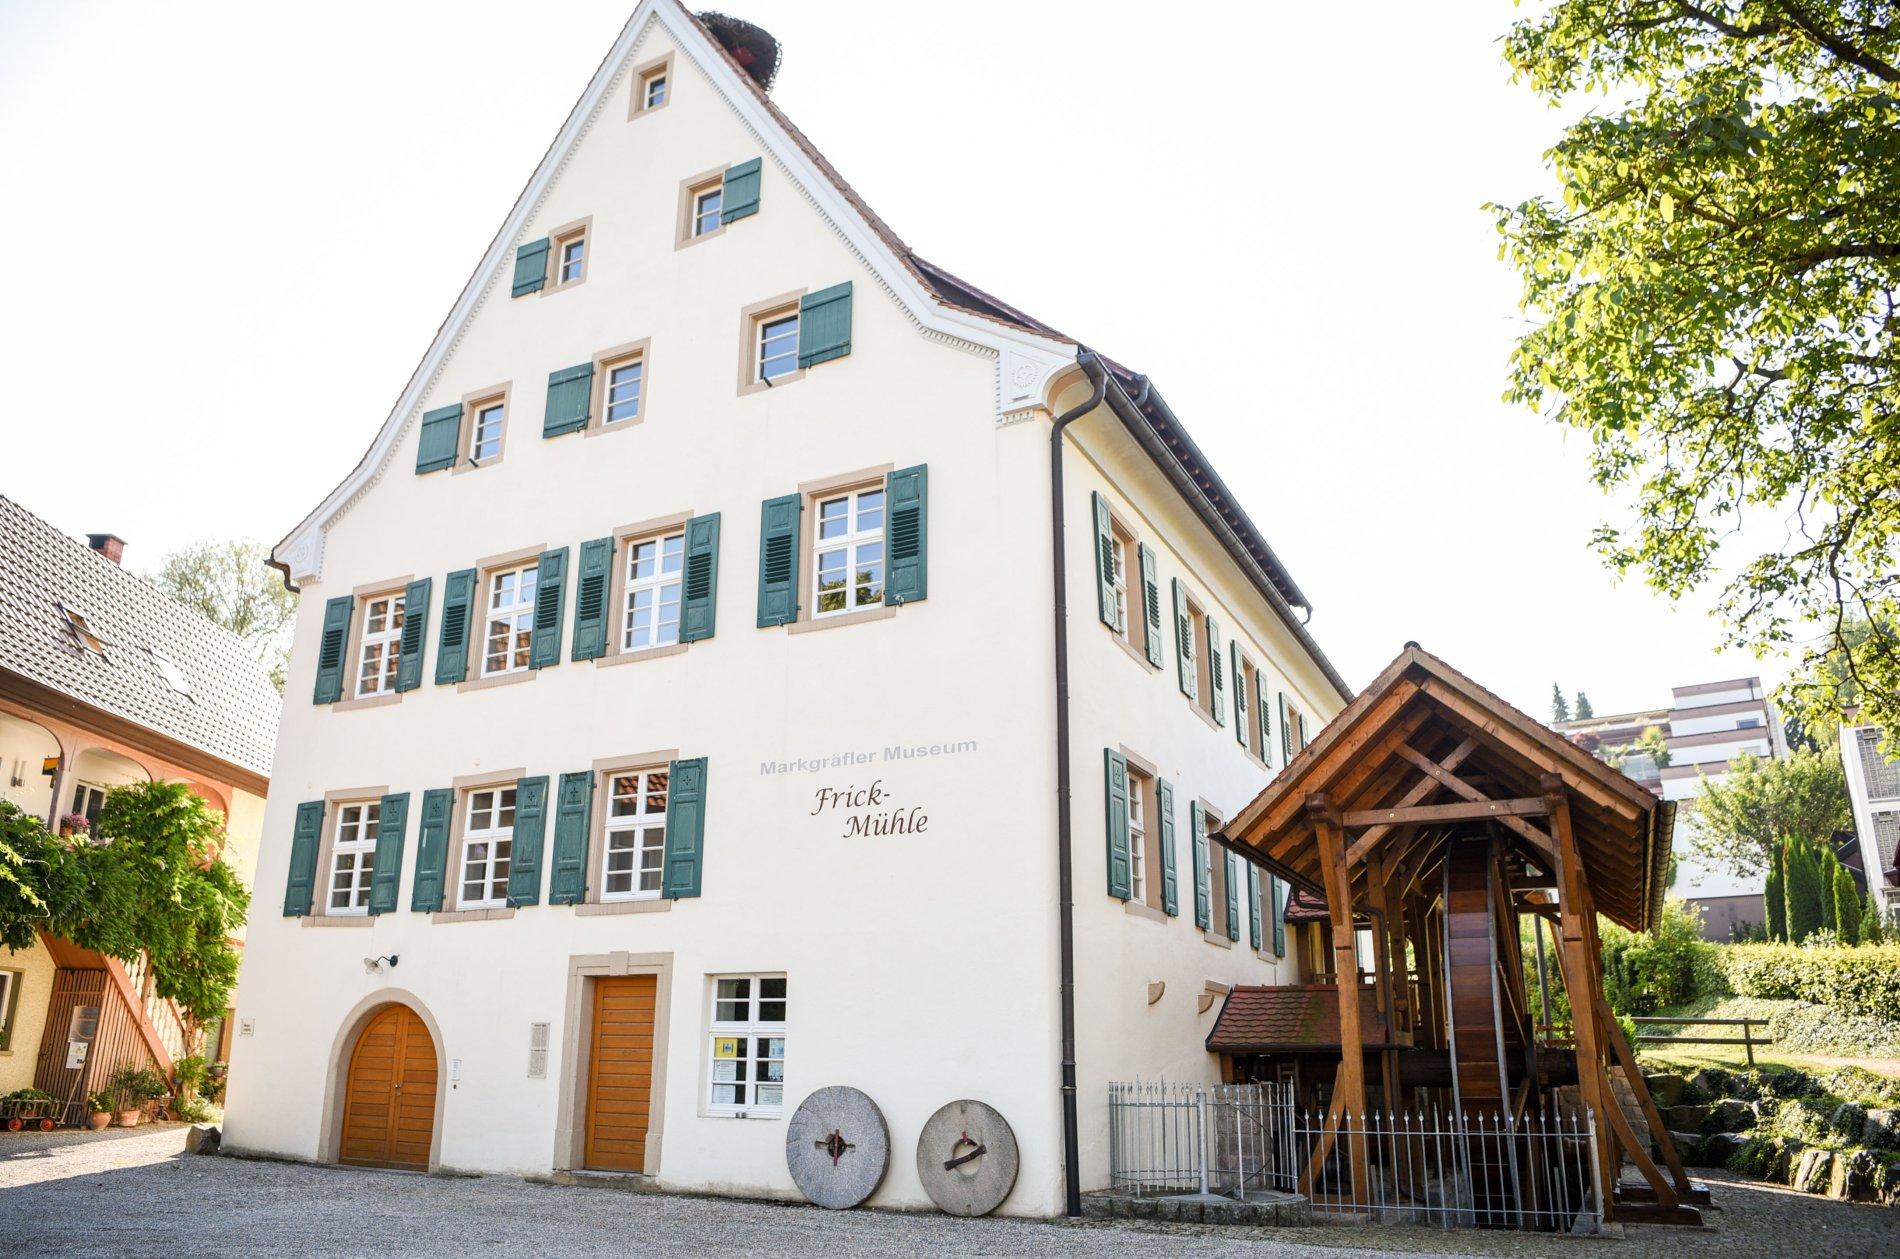 Mühlenmuseum Frick Mühle